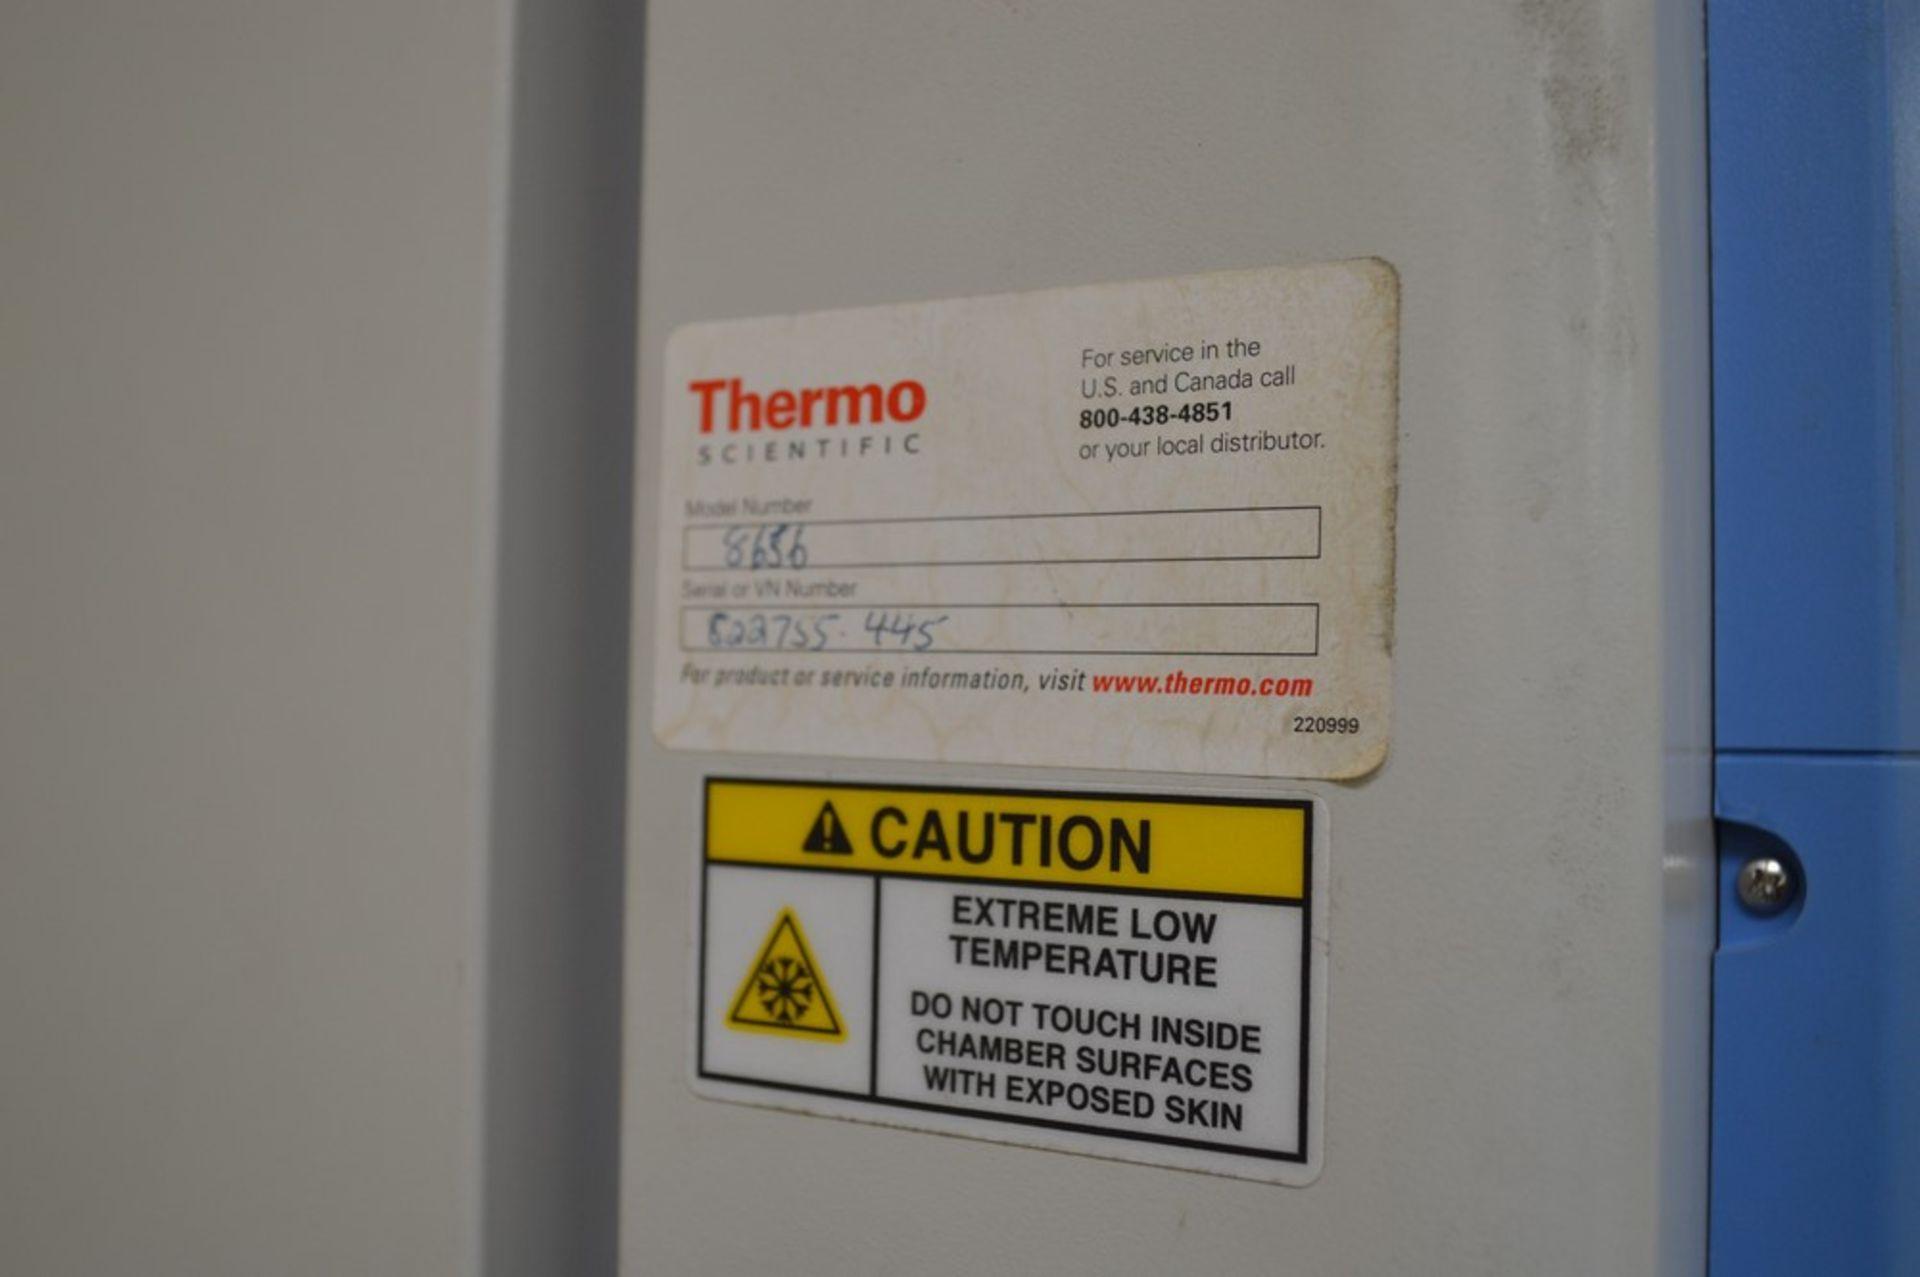 Therma Scientific Forma 8600 Series, Model 8656 Deep Freeze Refrigorator (-86 F) - Image 4 of 7